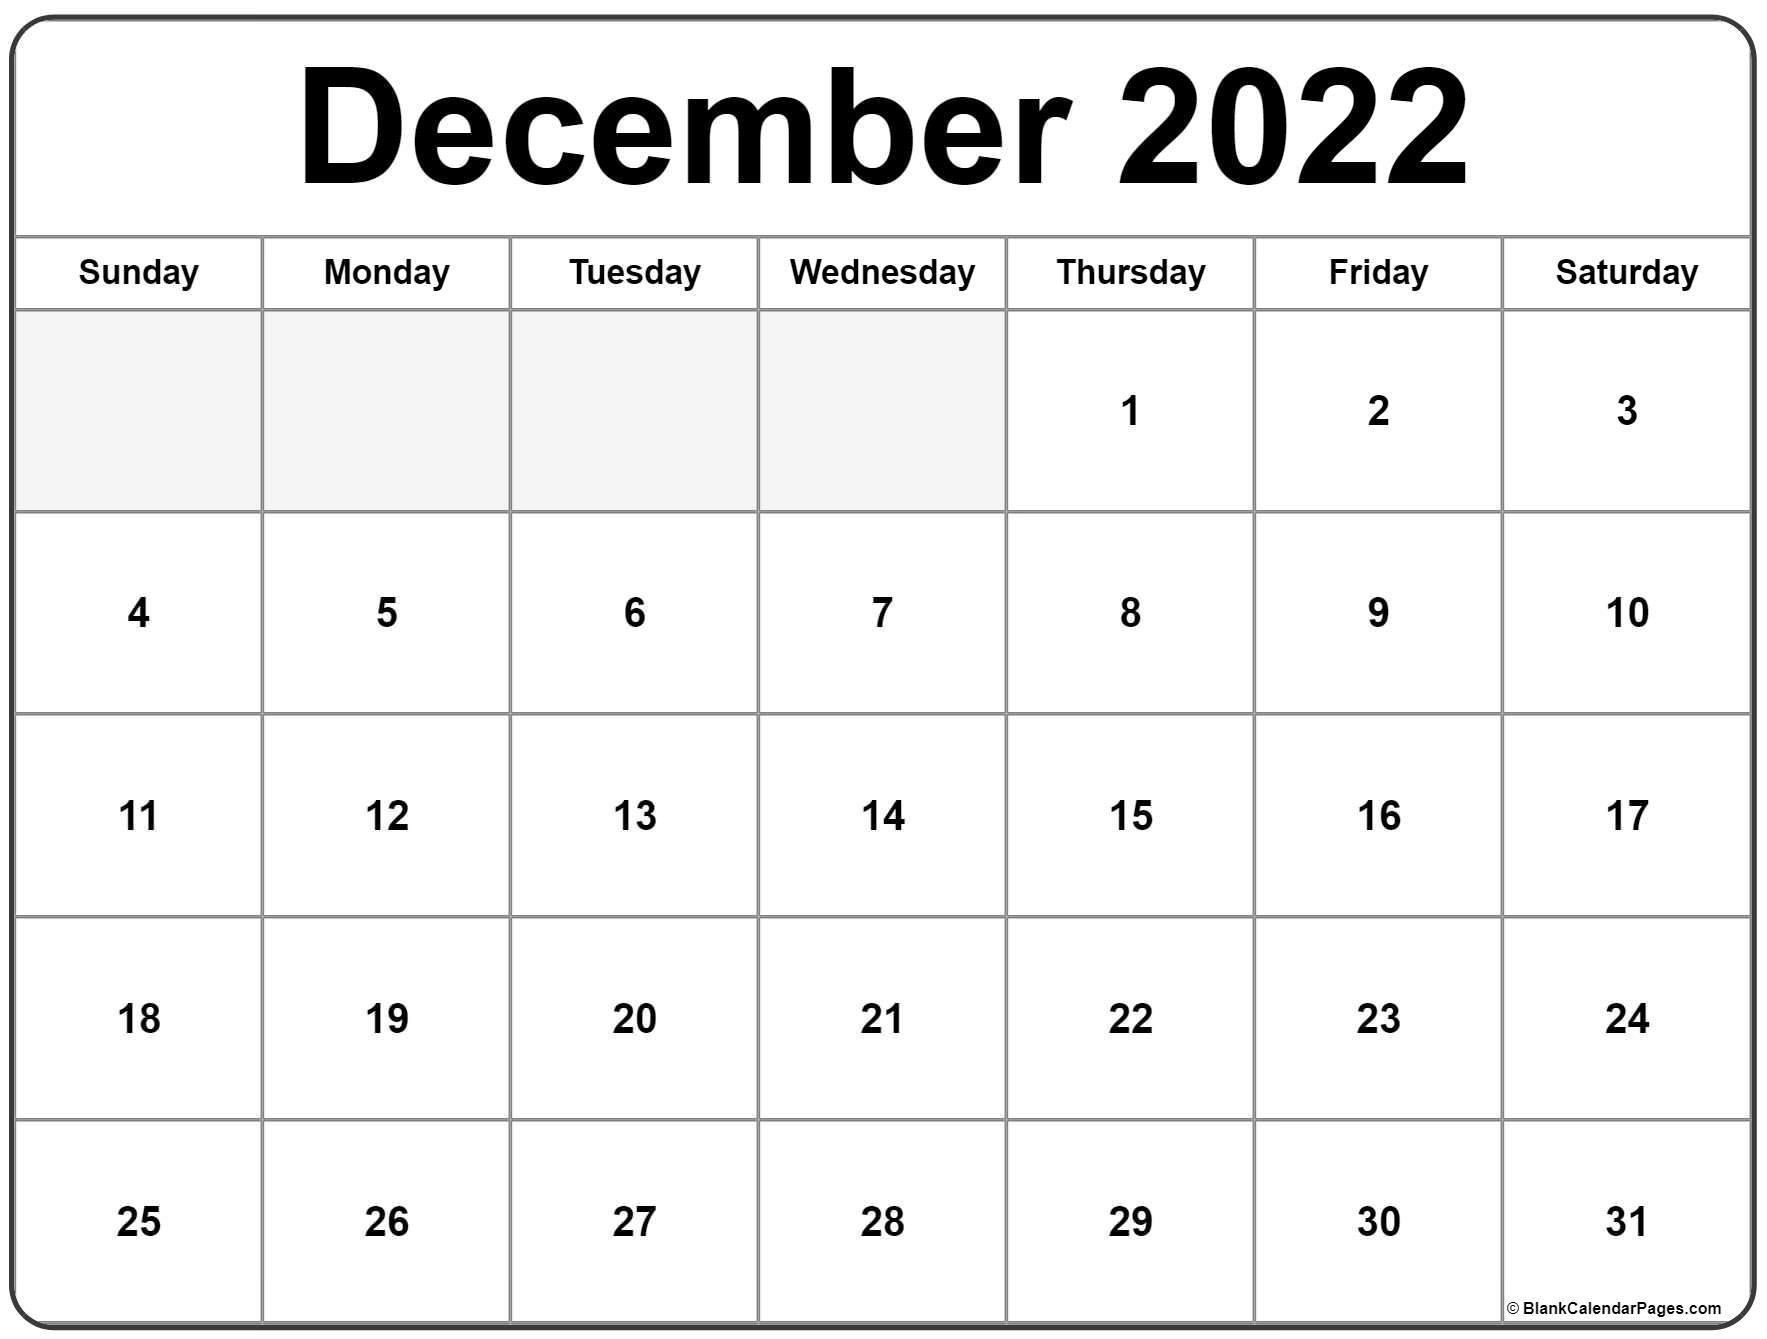 November december printable calendar 2021 template december 2021 january 2022 calendar printable december 2021 january 2022 calendar printable december 2021 january 2022 calendar word. December 2022 calendar   free printable calendar templates